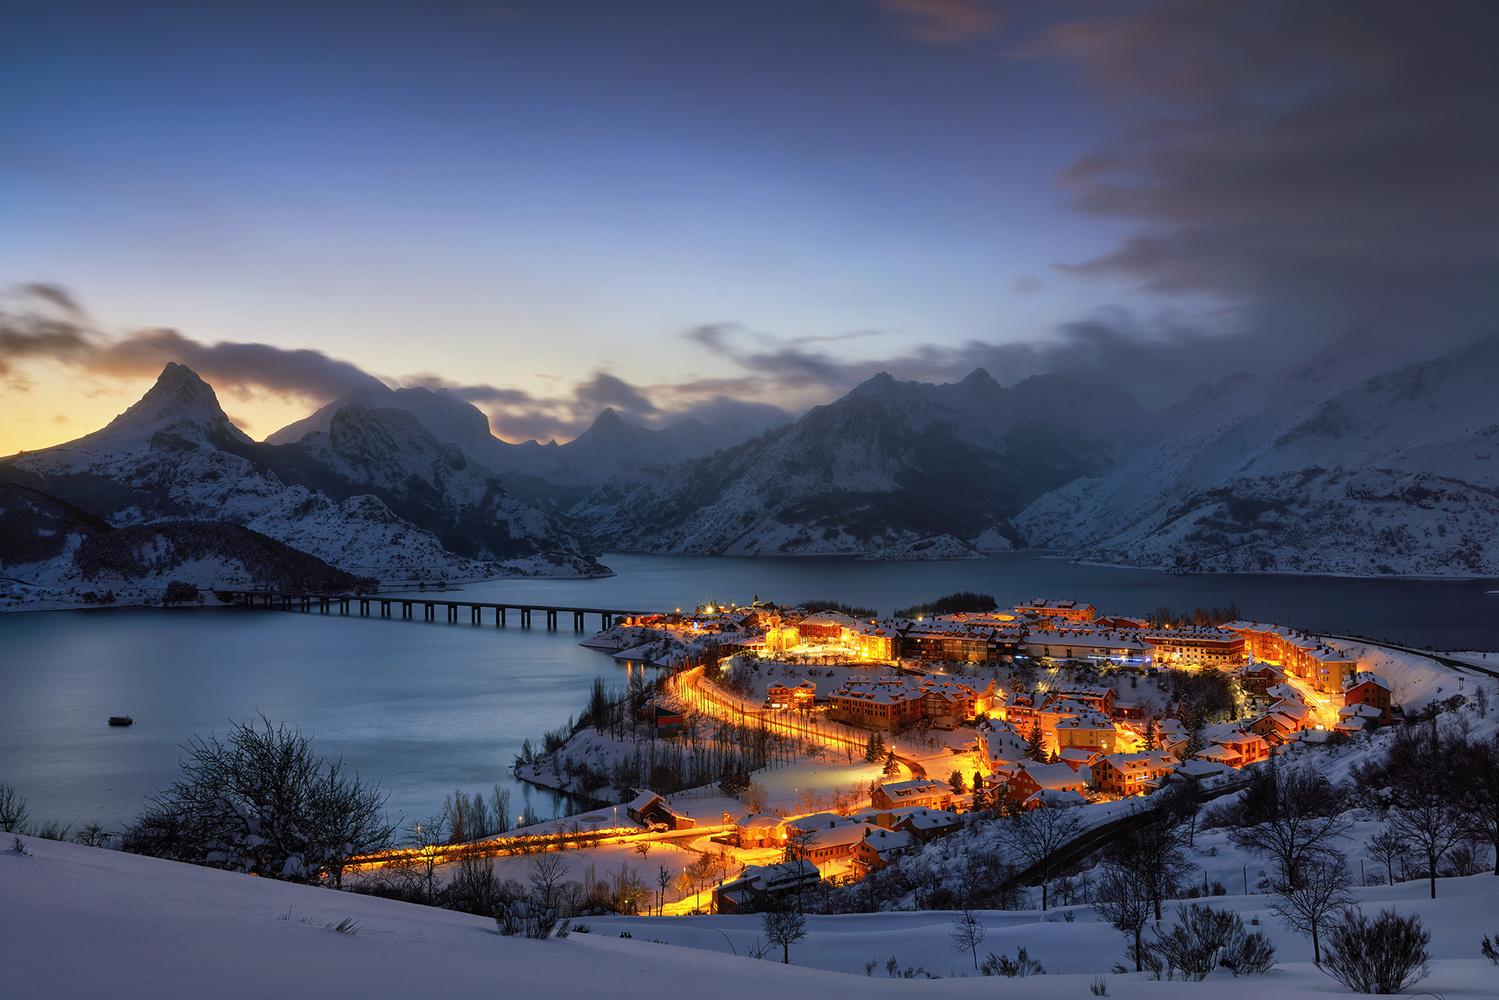 Last lights under the snow by Ignacio Municio